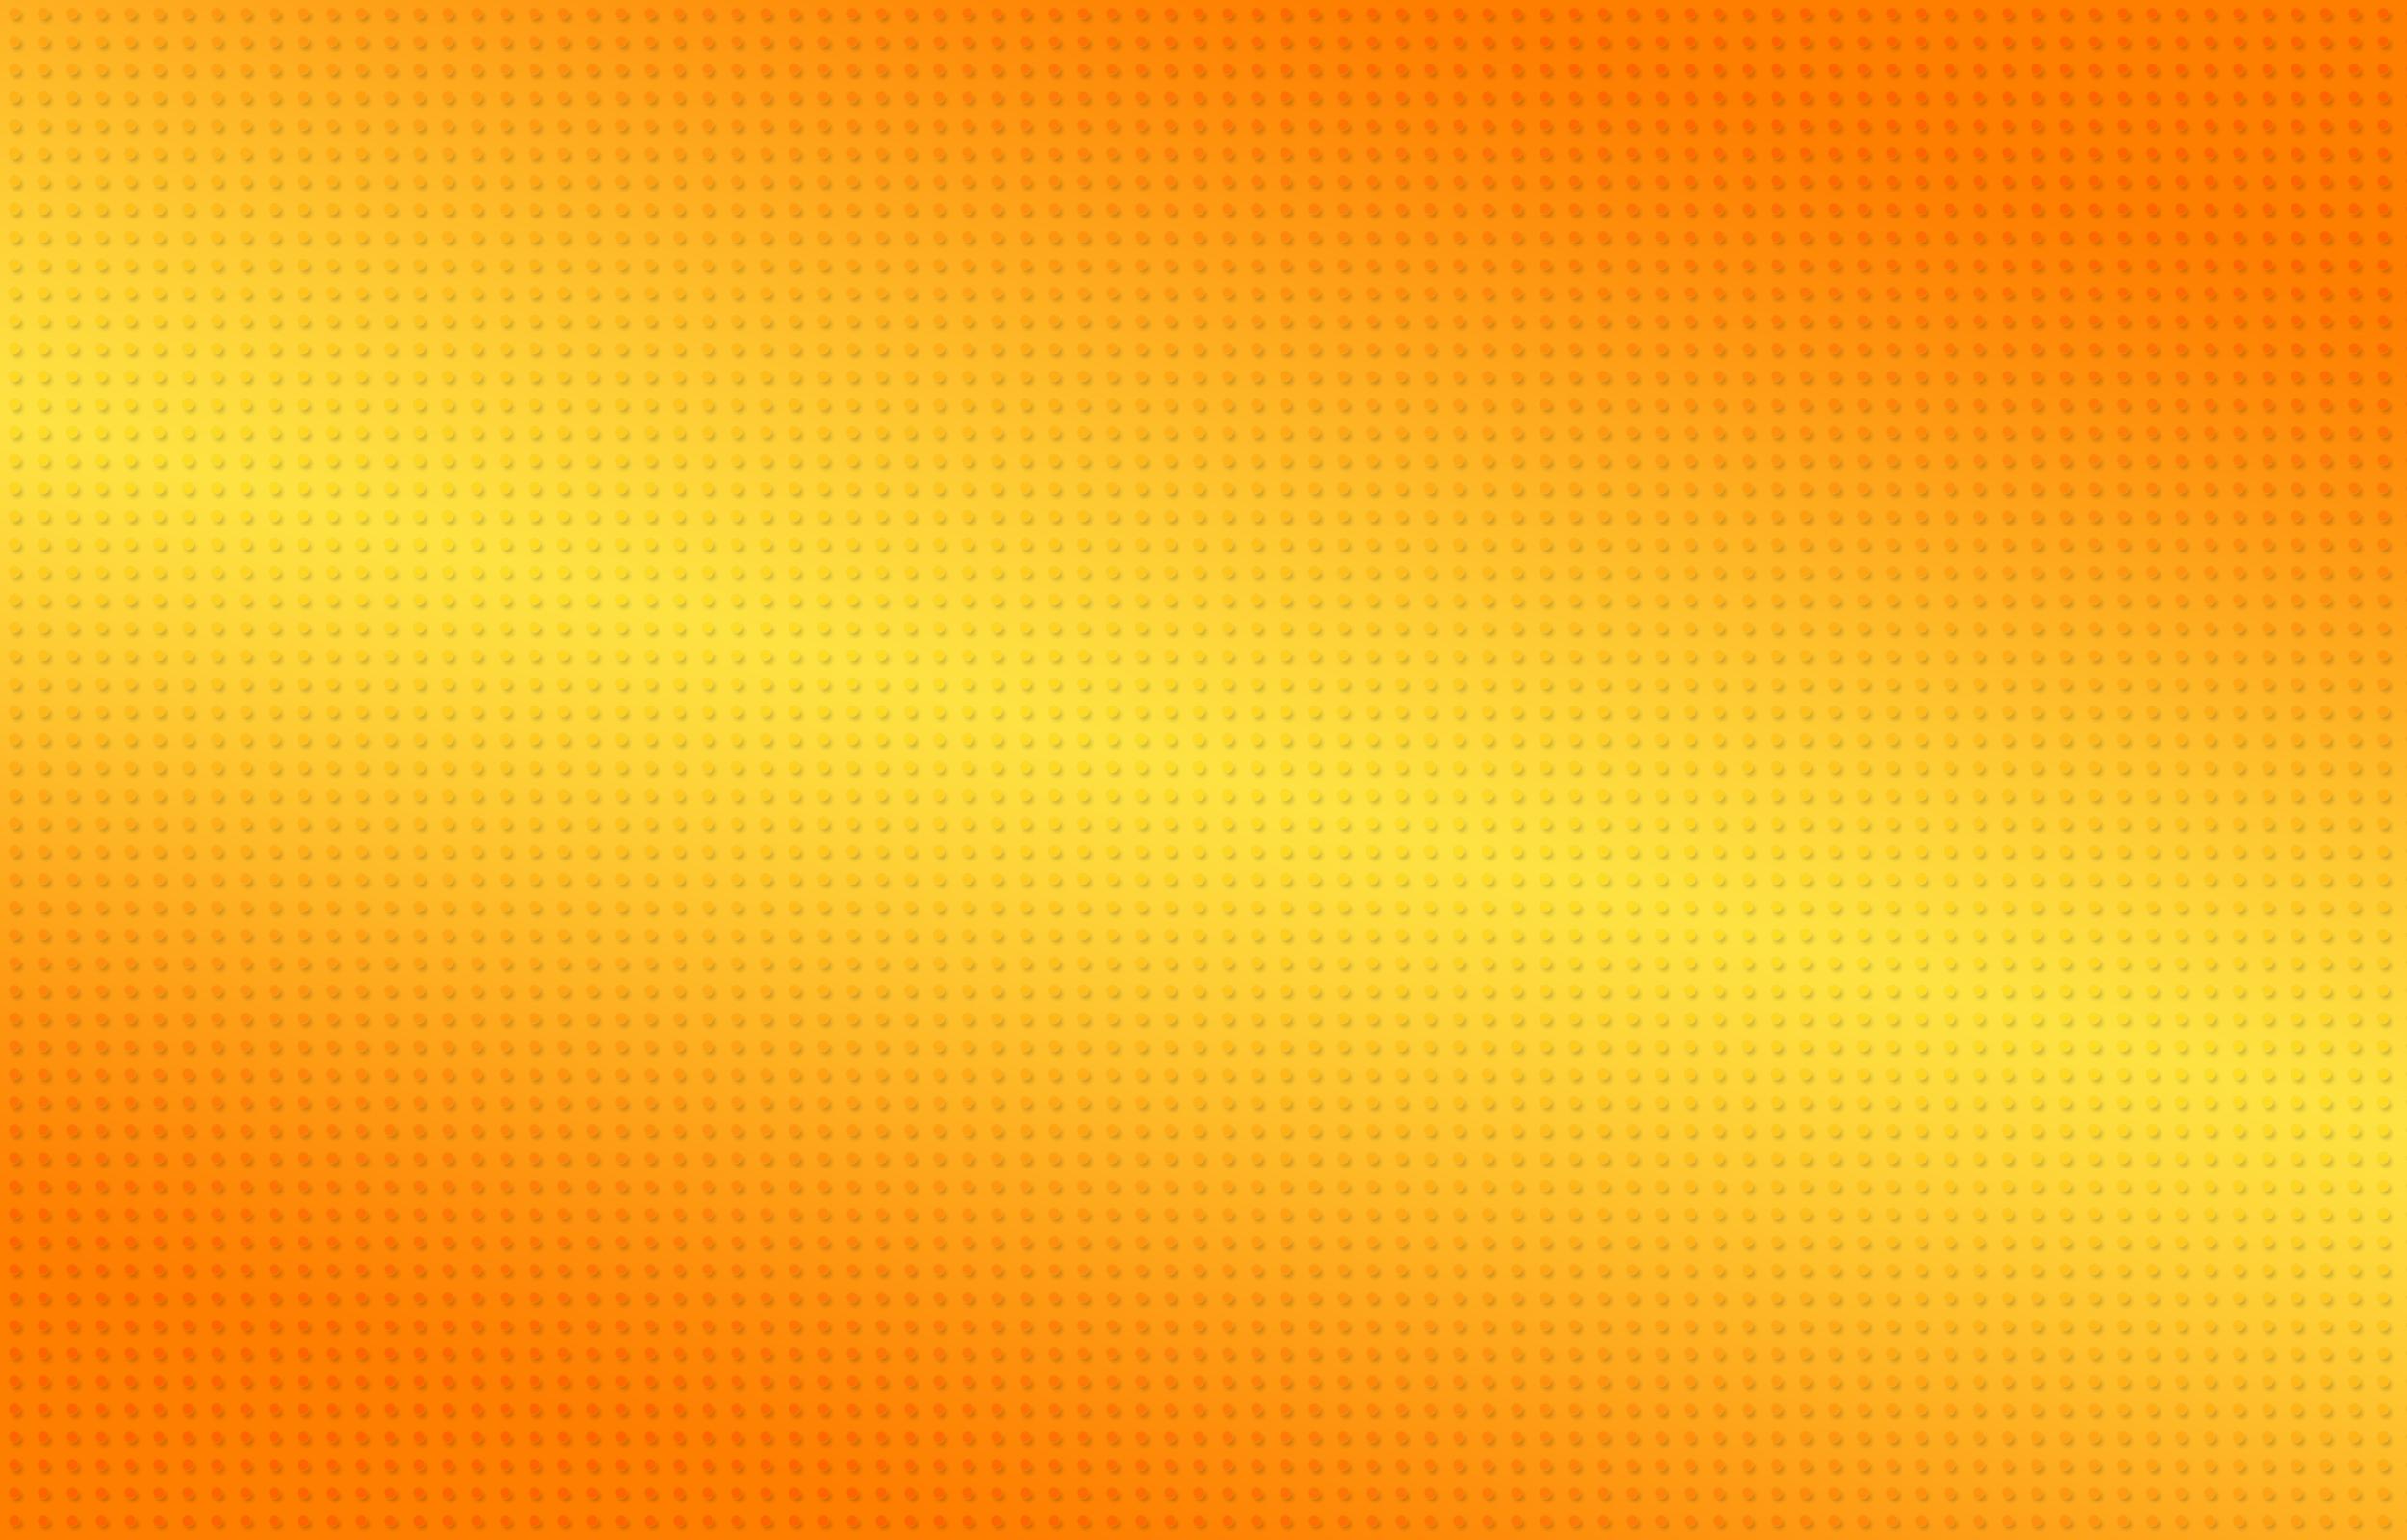 Orange HD Wallpaper Background Image 2500x1600 ID272707 2500x1600